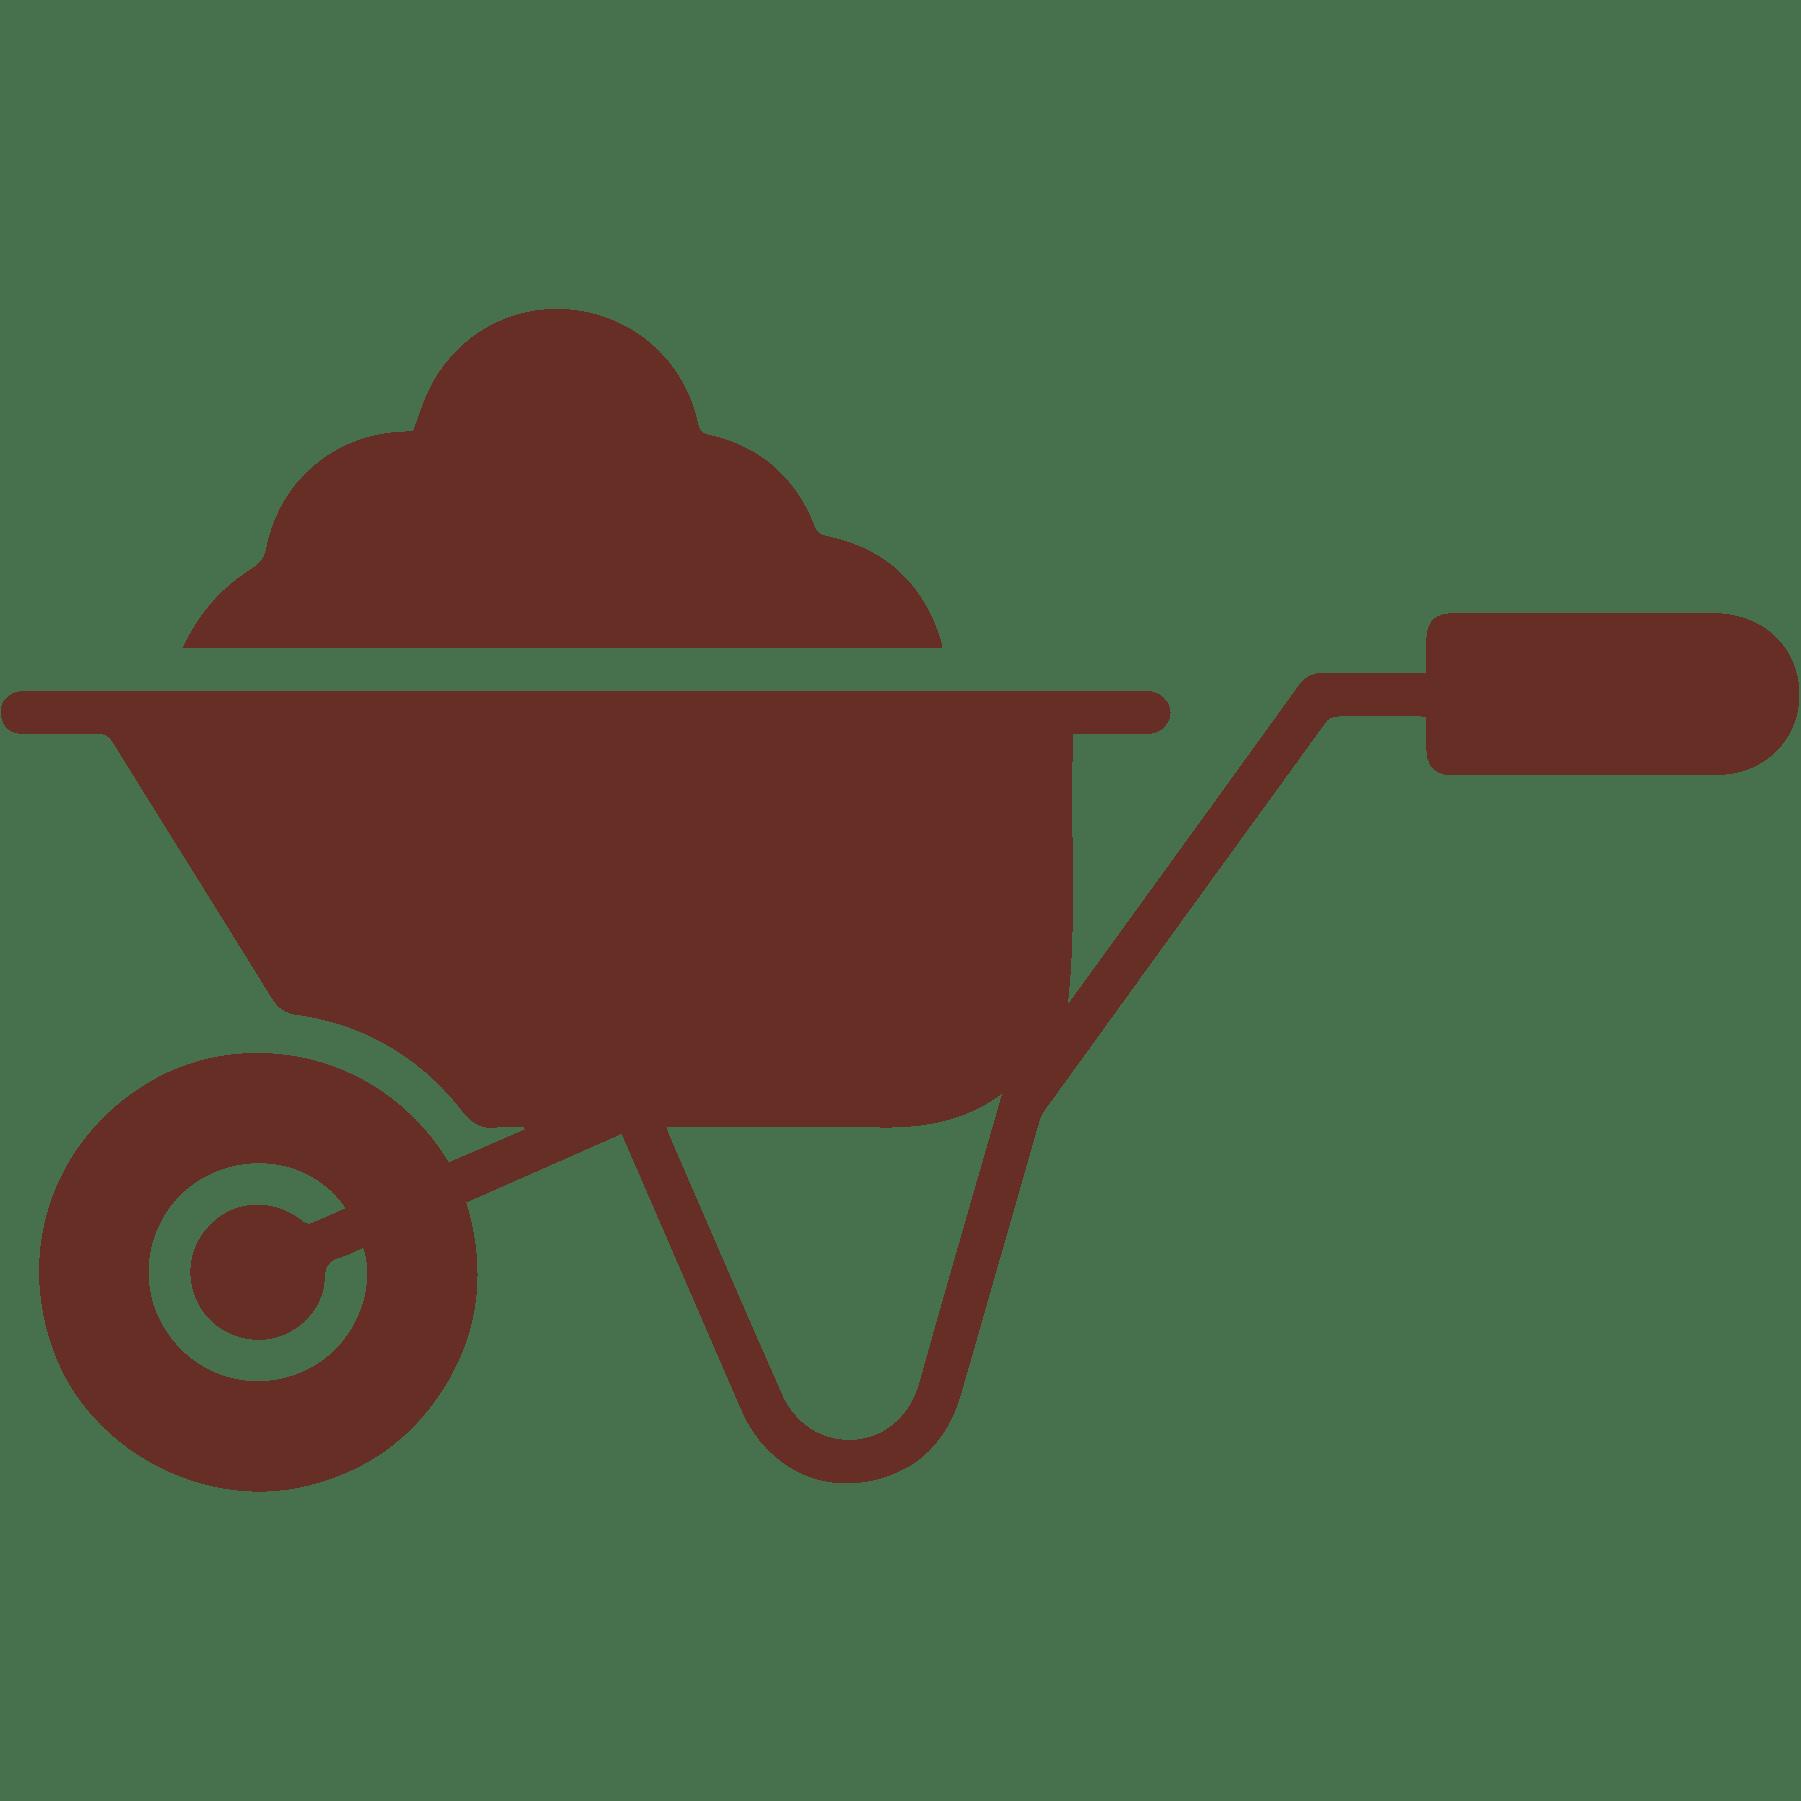 wheelbarrow full of mulch icon